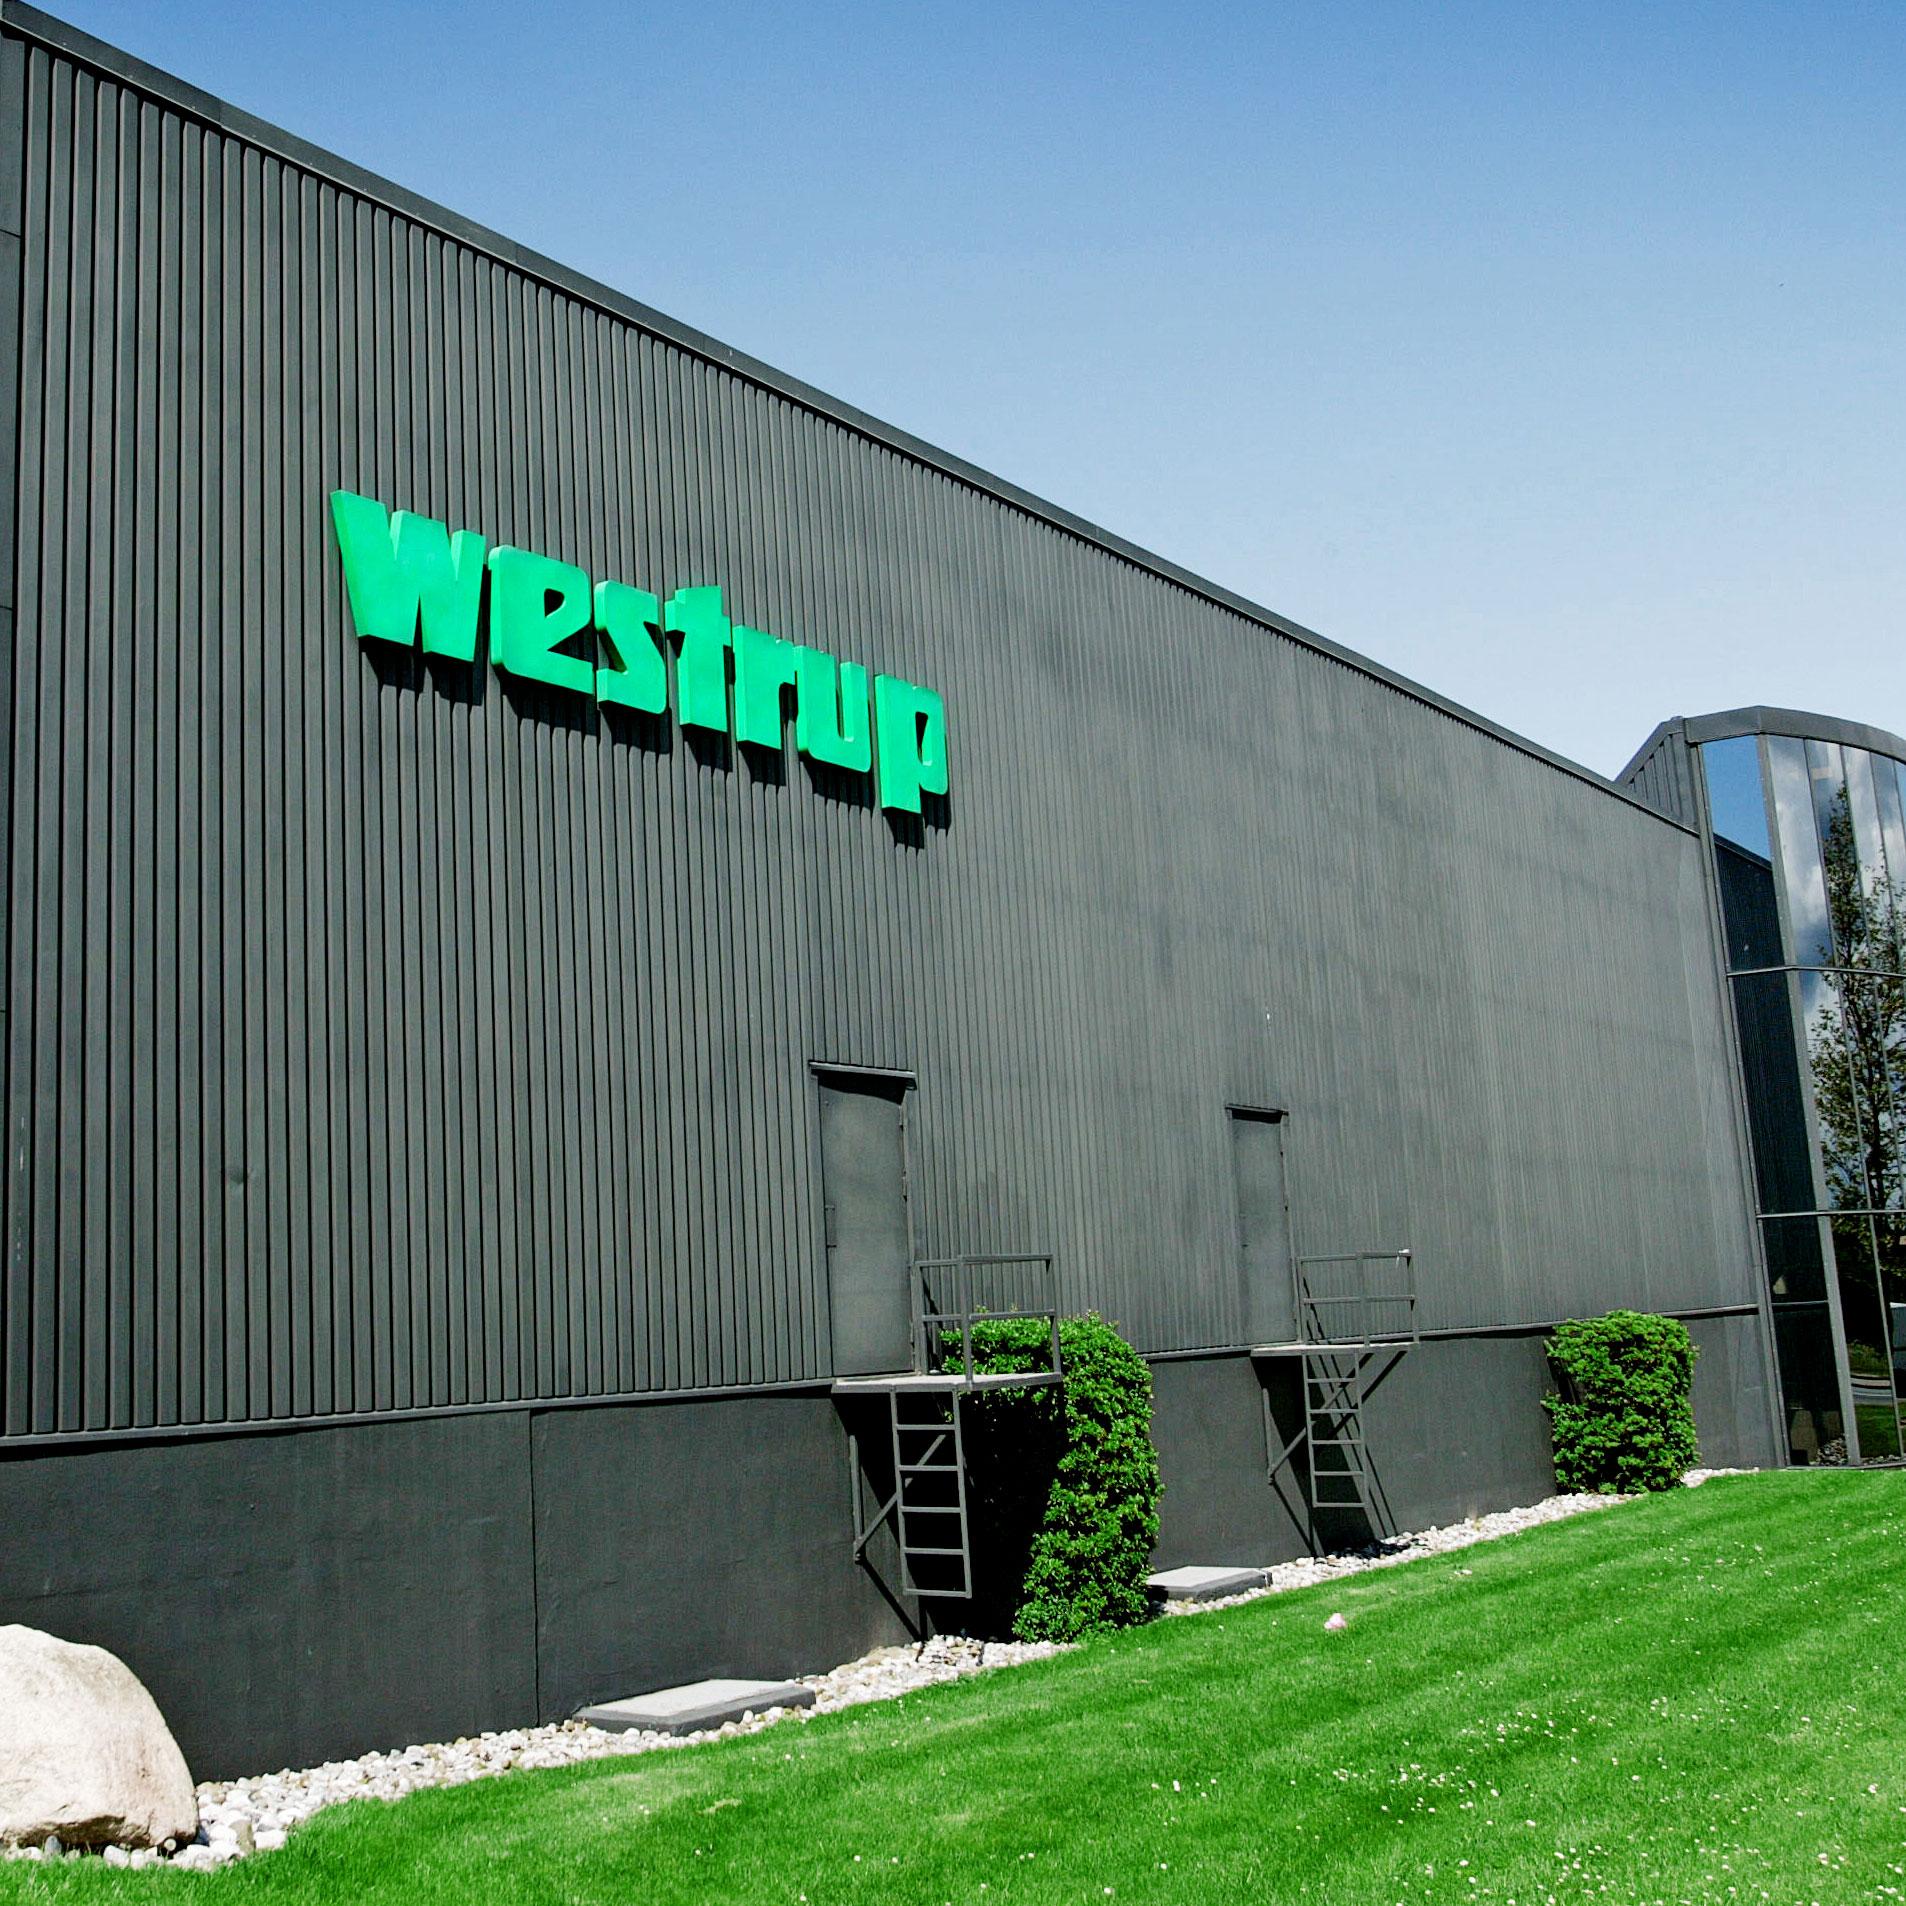 ....Name change to Westrup A/S ..Changement de nom : Westrup A/S ..Namensänderung zu Westrup A/S .. 公司正式更名为 伟世卓 .. Изменение названия на Westrup A/S ....